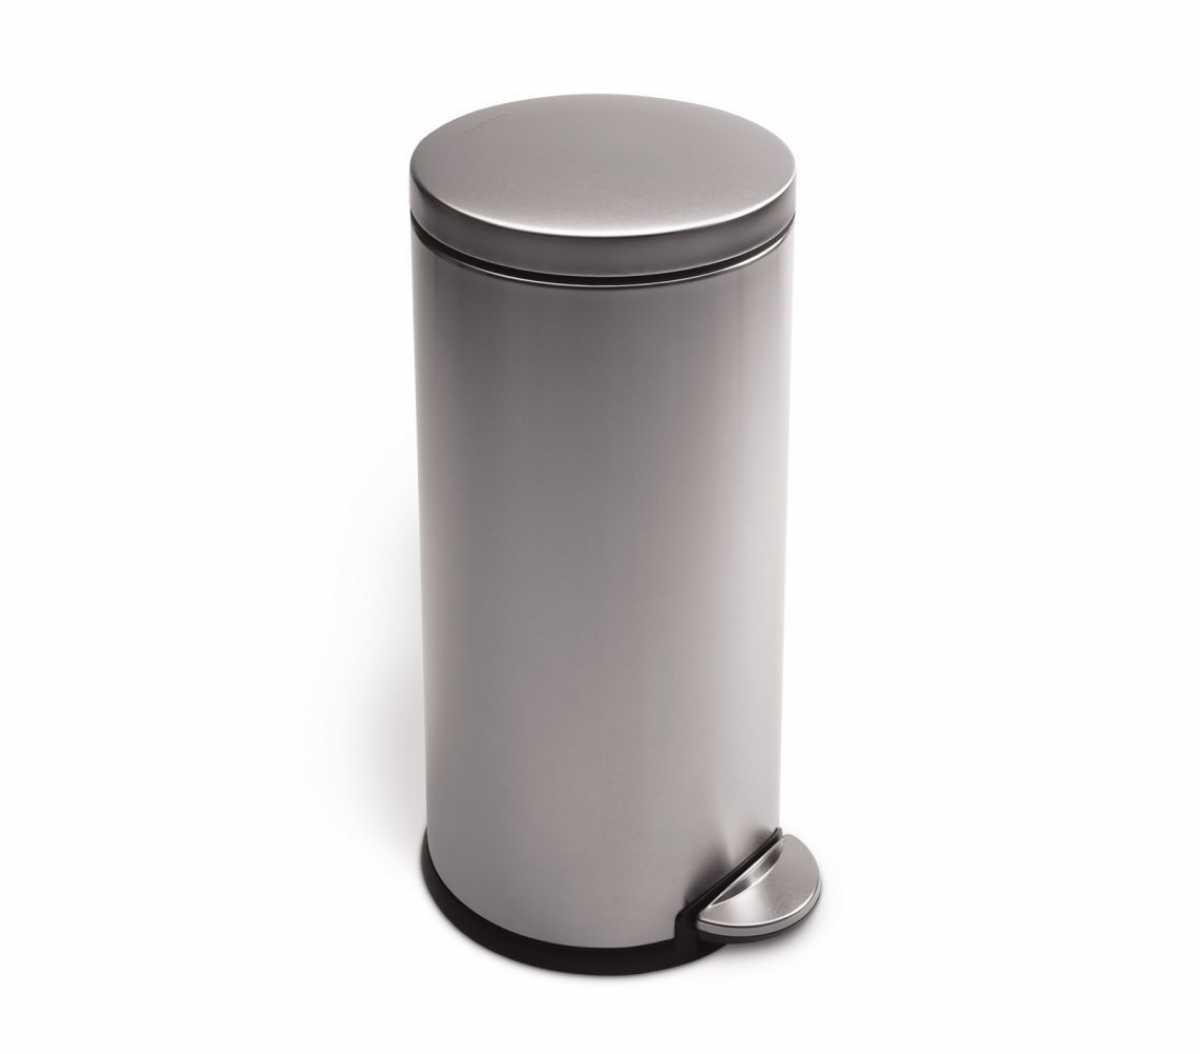 Pedallı Çöp Kovası, 30 litre